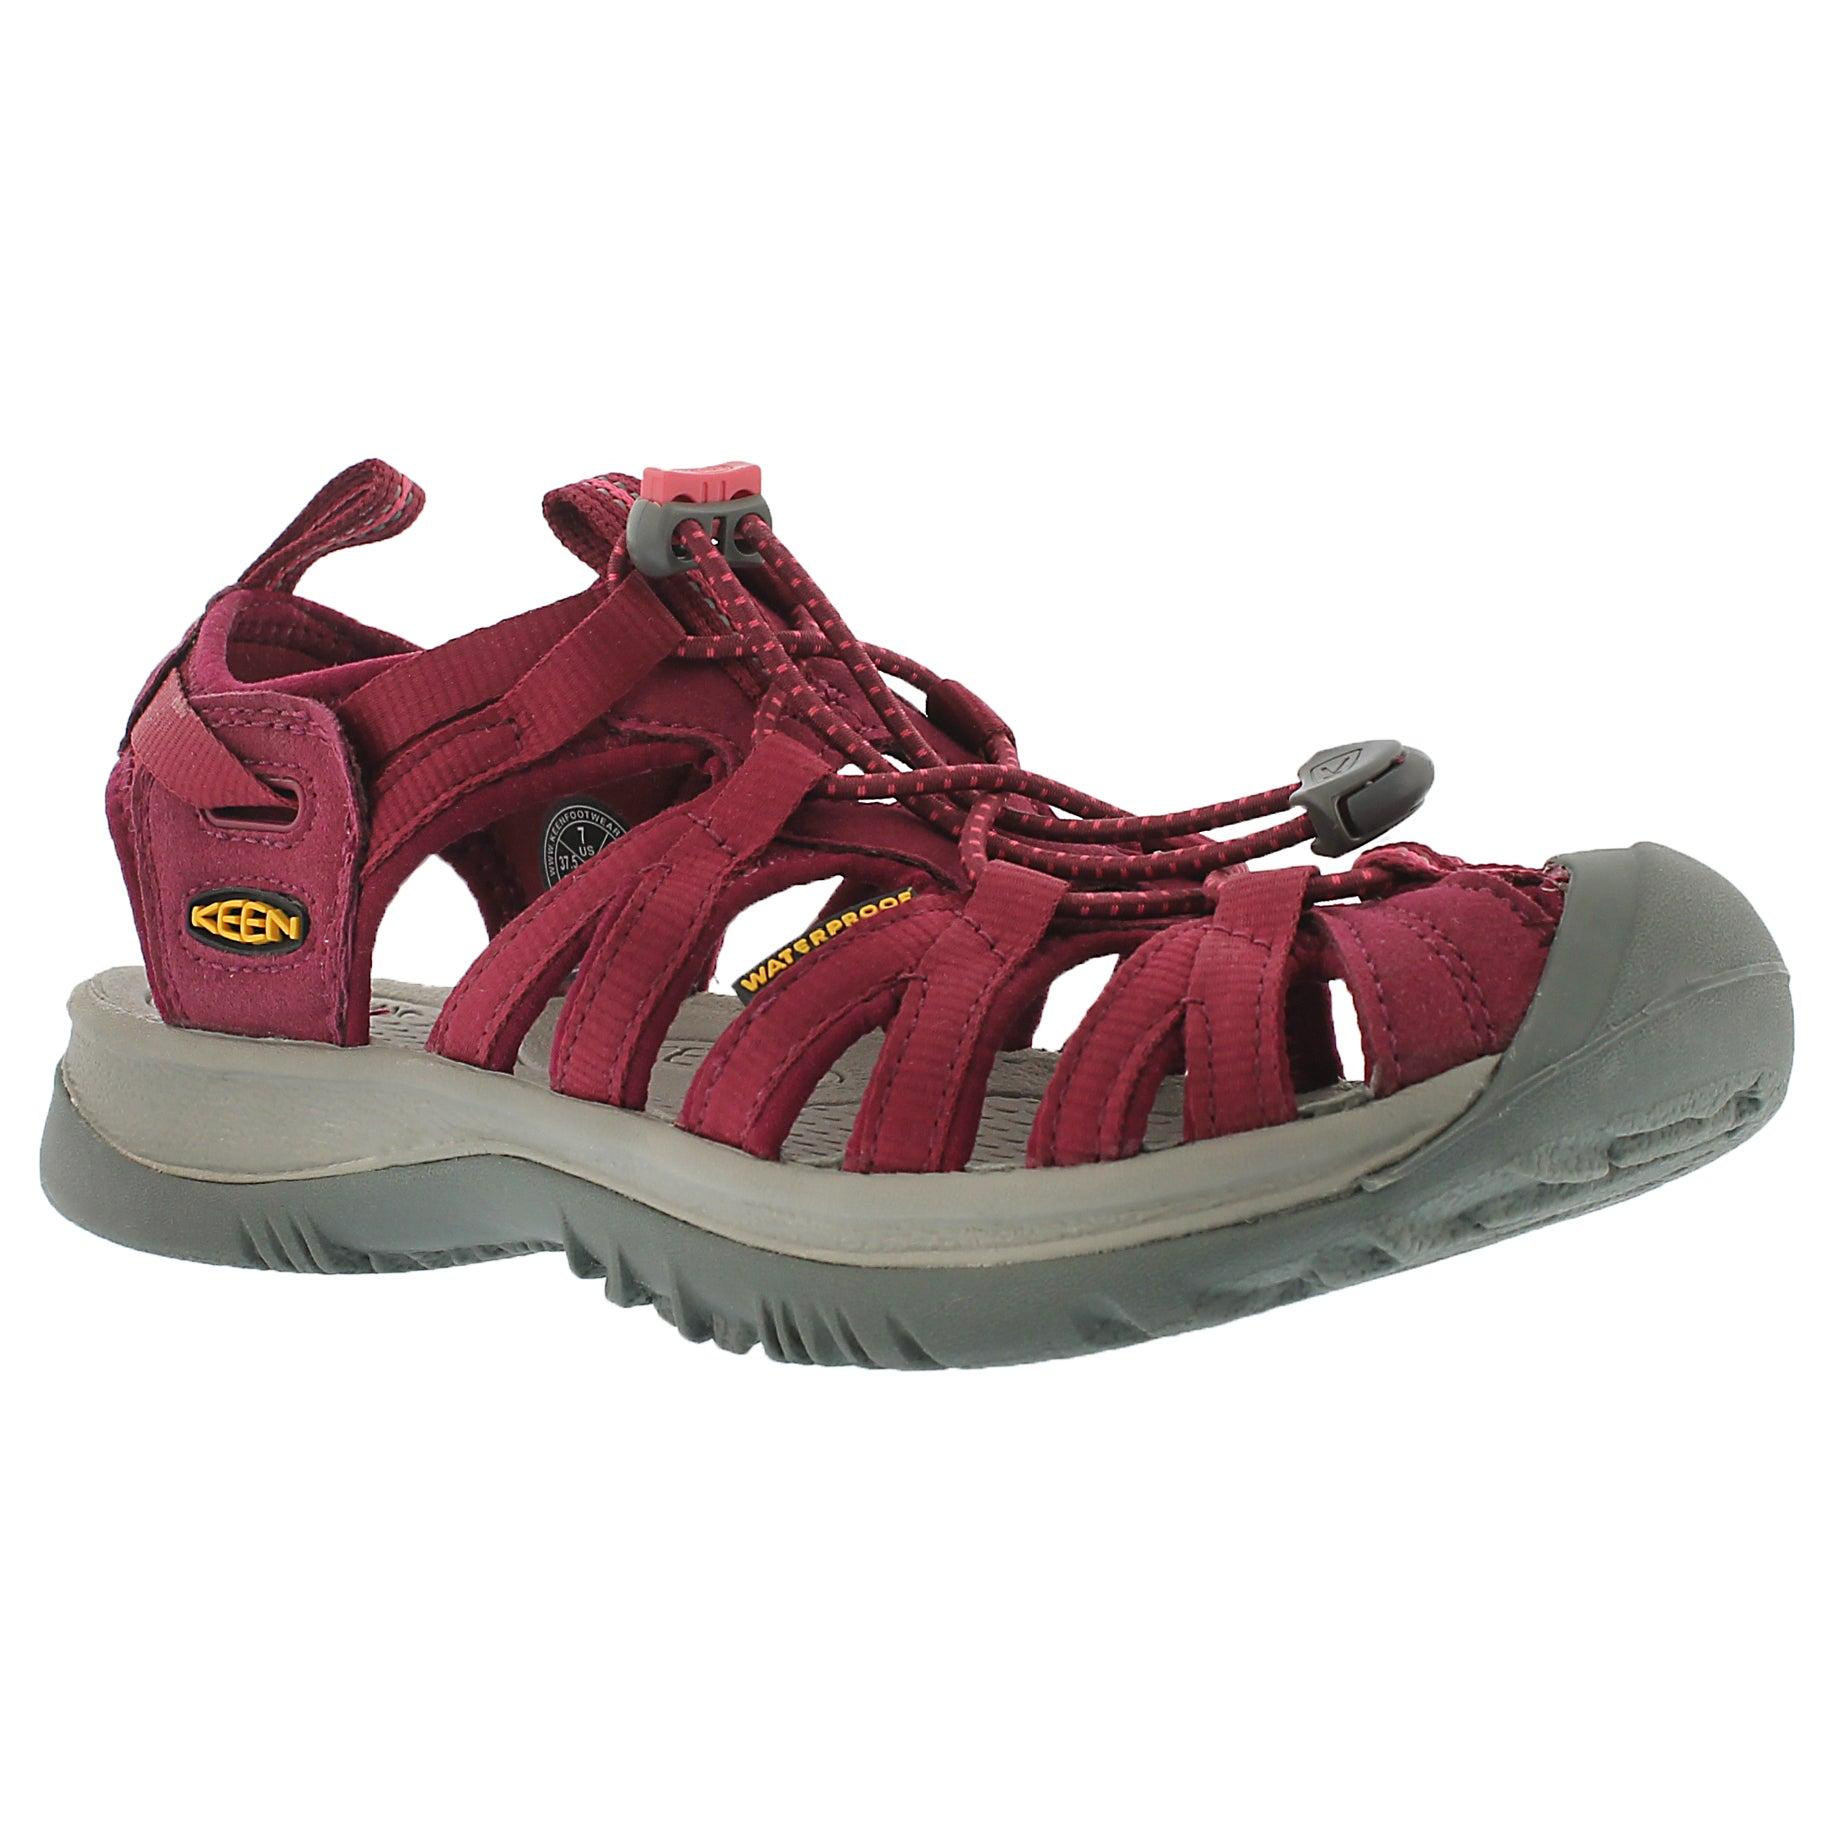 Women's WHISPER beet red sport sandals